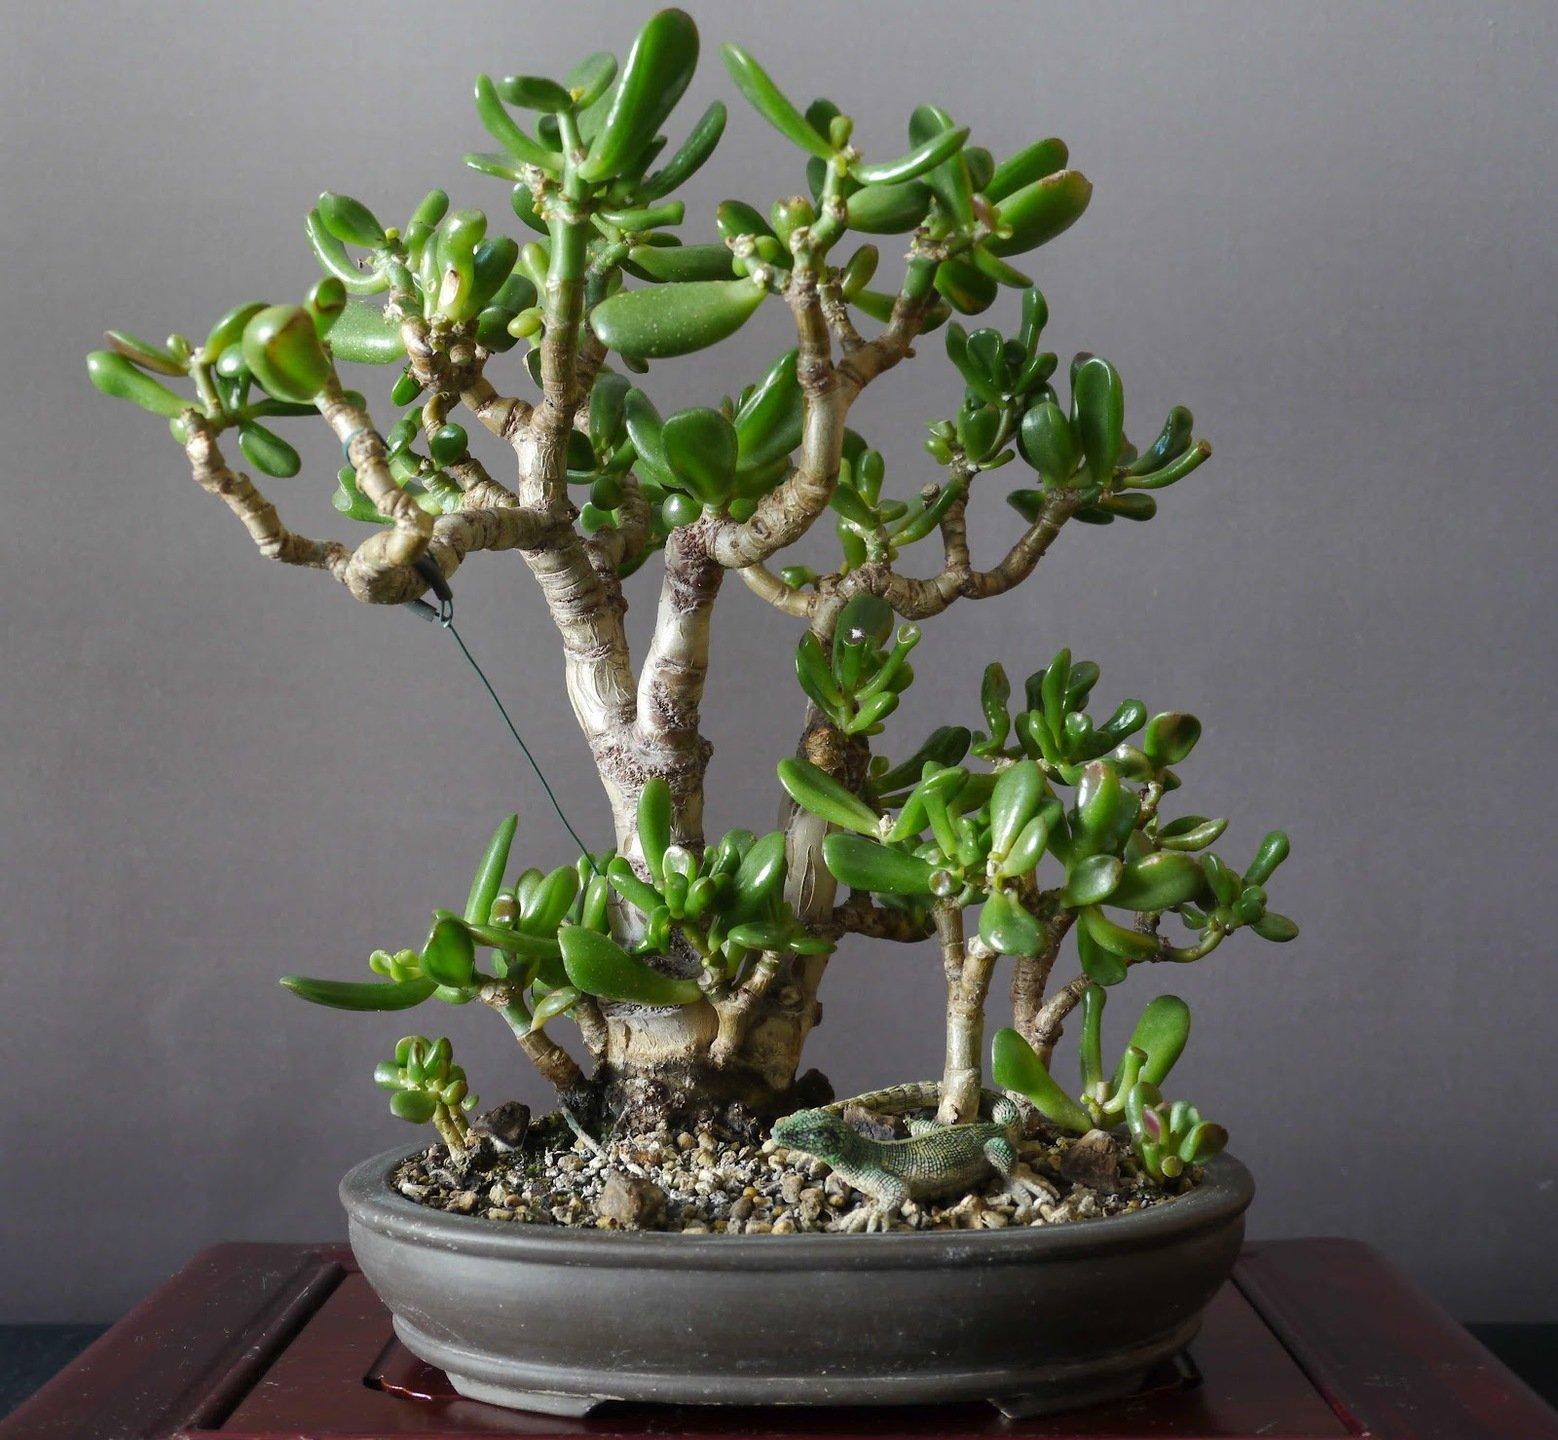 Денежное дерево: уход за толстянкой в домашних условиях